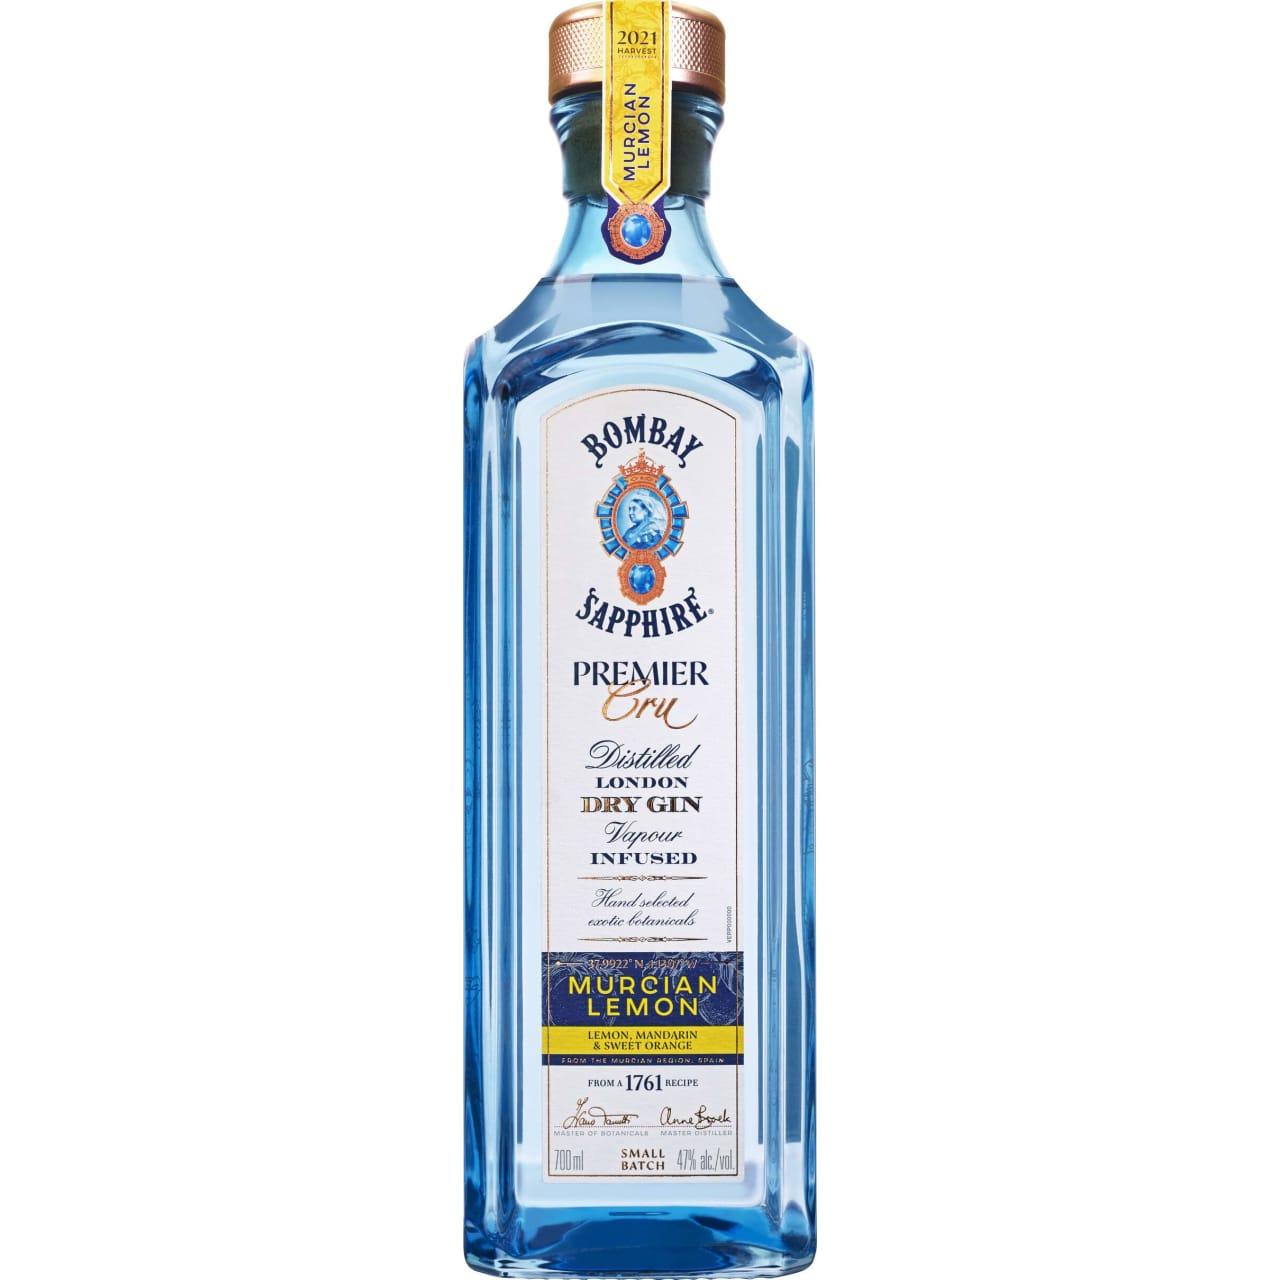 Product Image - Bombay Sapphire Premier Cru Gin